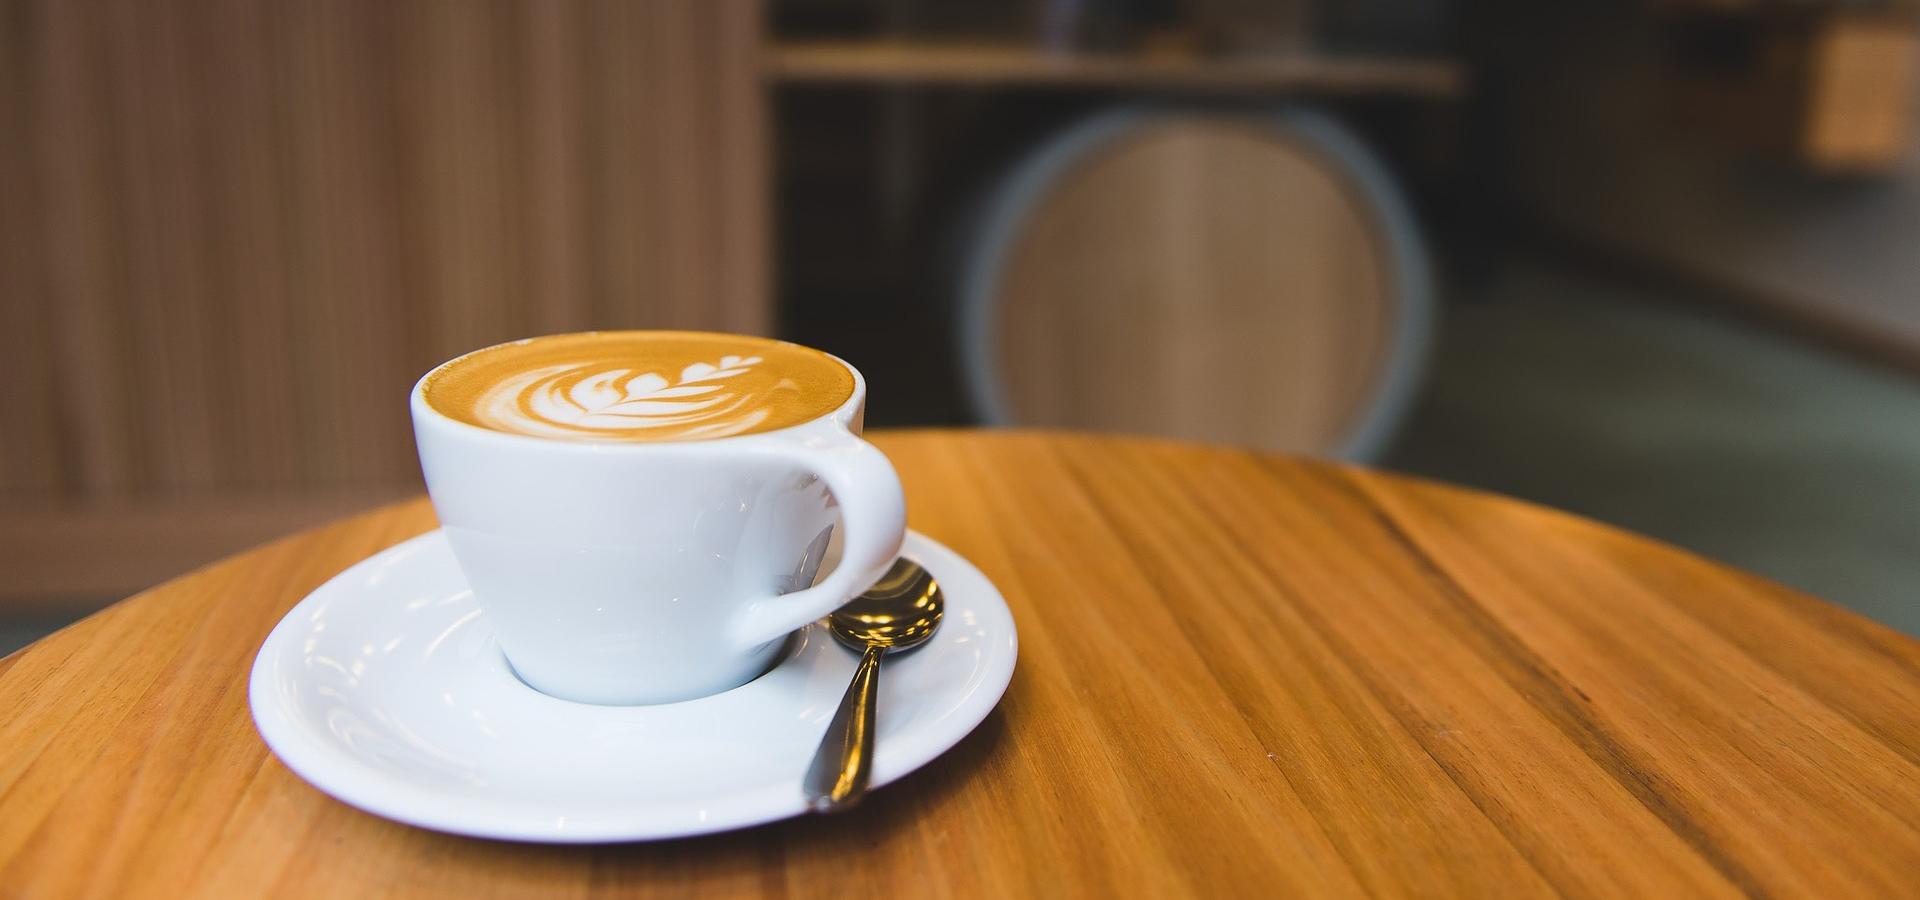 kaffeevollautomat mit Milchpulver vs. frischmilch kaffeemaschine büro kaffeemaschine kaffeevollautomat büro kaffeevollautomat Topping Magermilchpulver Vollmilchpulver Milch topping Milchschaum gastro kaffeemaschine gastronomie kaffeemaschine industrie kaffeemaschine industrie kaffeemaschine gastro kaffeemaschine kaffeevollautomat mit Milchpulver vs. frischmilch Topping Magermilchpulver Vollmilchpulver Milch topping Milchschaum gastro kaffeemaschine gastronomie kaffeemaschine industrie kaffeemaschine industrie Kaffeevollautomat für Gewerbe Vorteile Gastronomie Vollautomat Gewerbe Kaffeevollautomat Büro Kaffeevollautomat für Büro Kaffeevollautomat fürs Büro Kaffeevollautomat Büro geeignet, kaffeevollautomat büro mieten, kaffeevollautomat büro test, kaffeevollautomat büro mieten kosten, kaffeevollautomat büro gewerbe, kaffeevollautomat büro kaufen, kaffeevollautomat büro 10 personen, kaffeevollautomat büro leasen, kaffeevollautomat büro vergleich